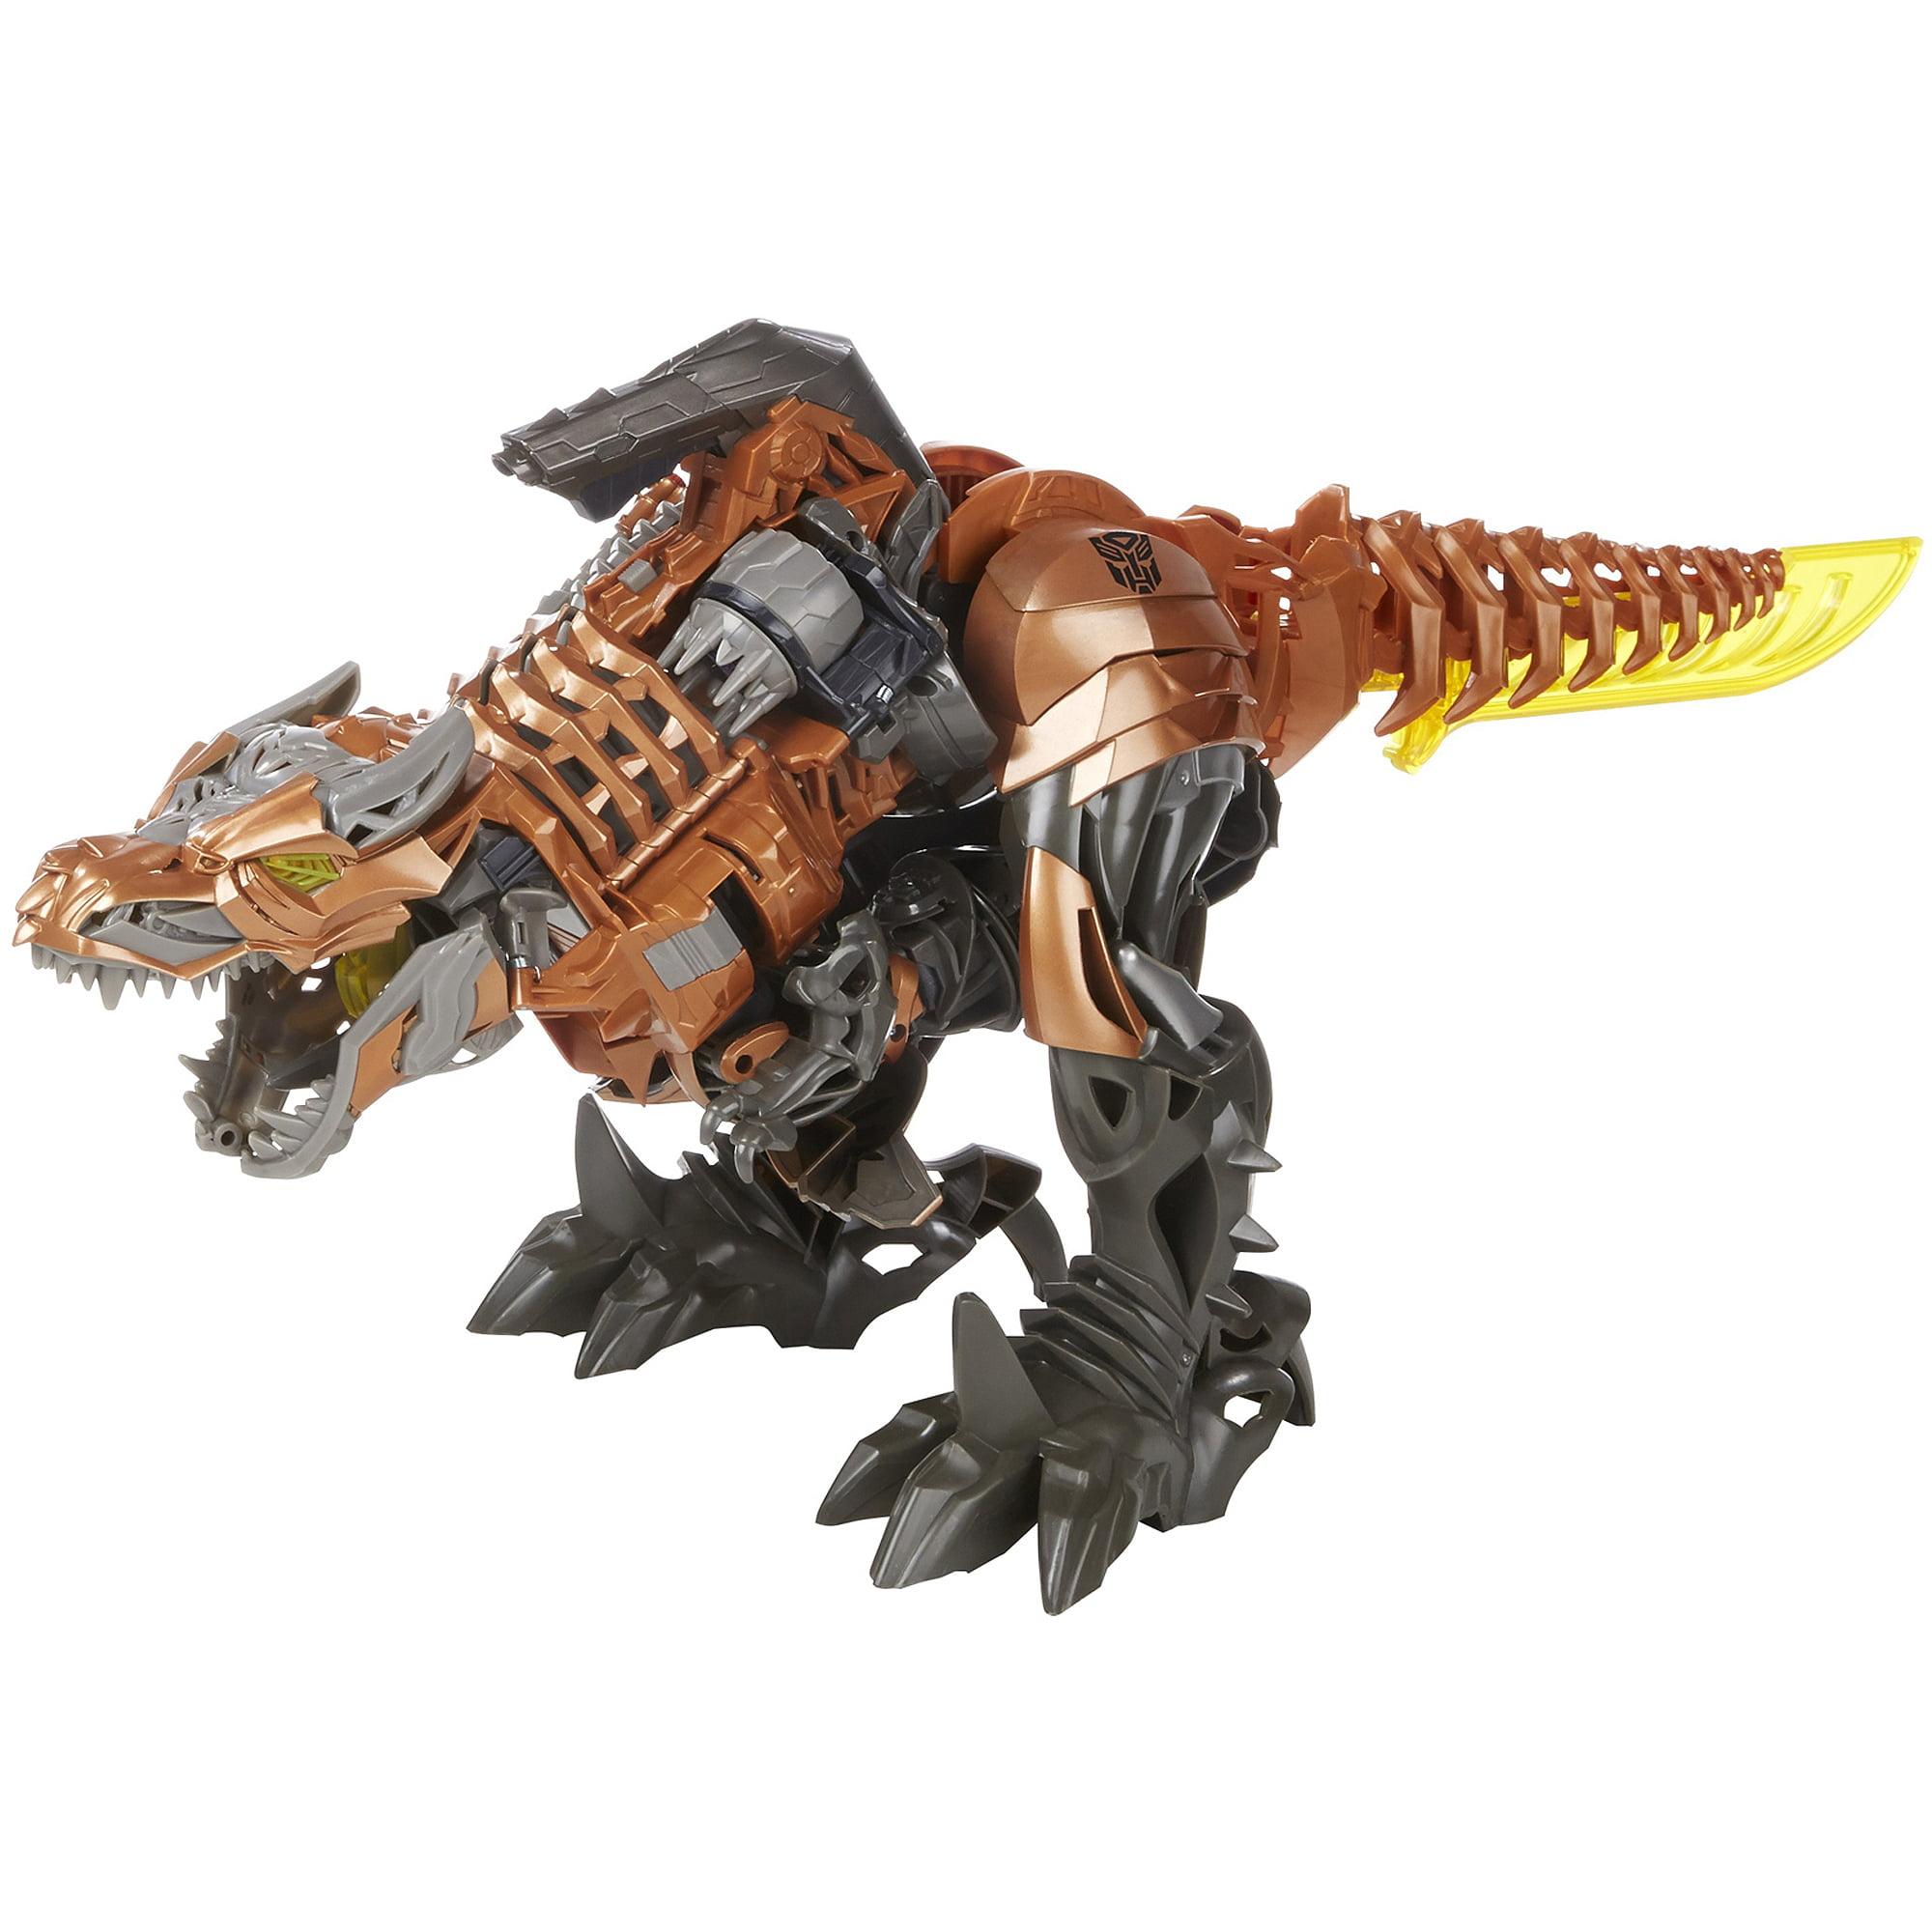 Transformers Age of Extinction Stomp & Chomp Grimlock Figure by